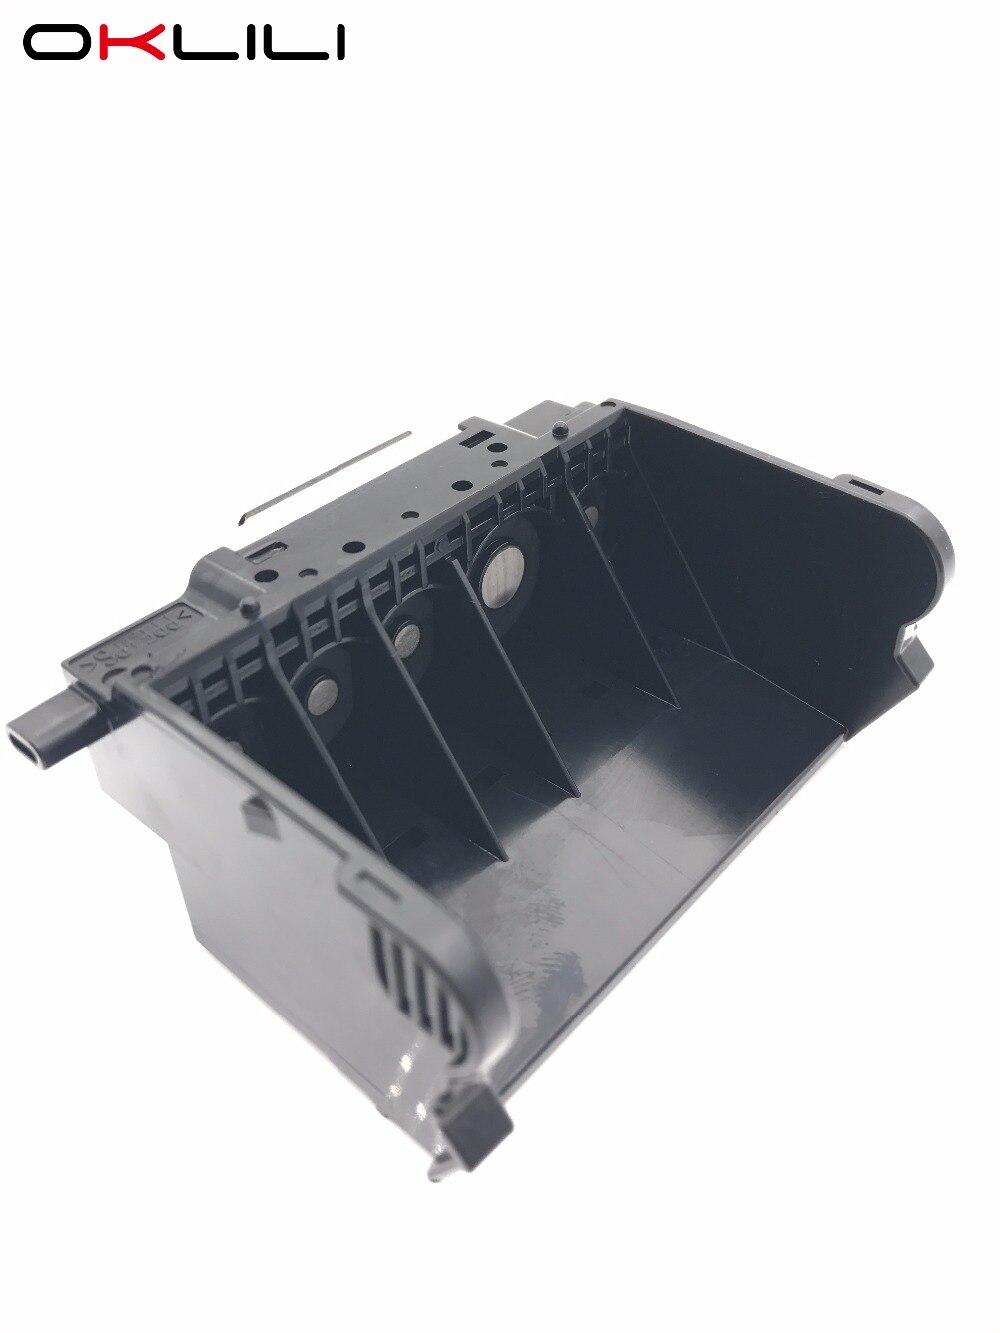 Printer Parts Inkjet Printer Print Head QY6-0075 Original Product Yoton for Canon Nozzle iP5300 MP810 iP4500 MP610 MX850 0075 Nozzle